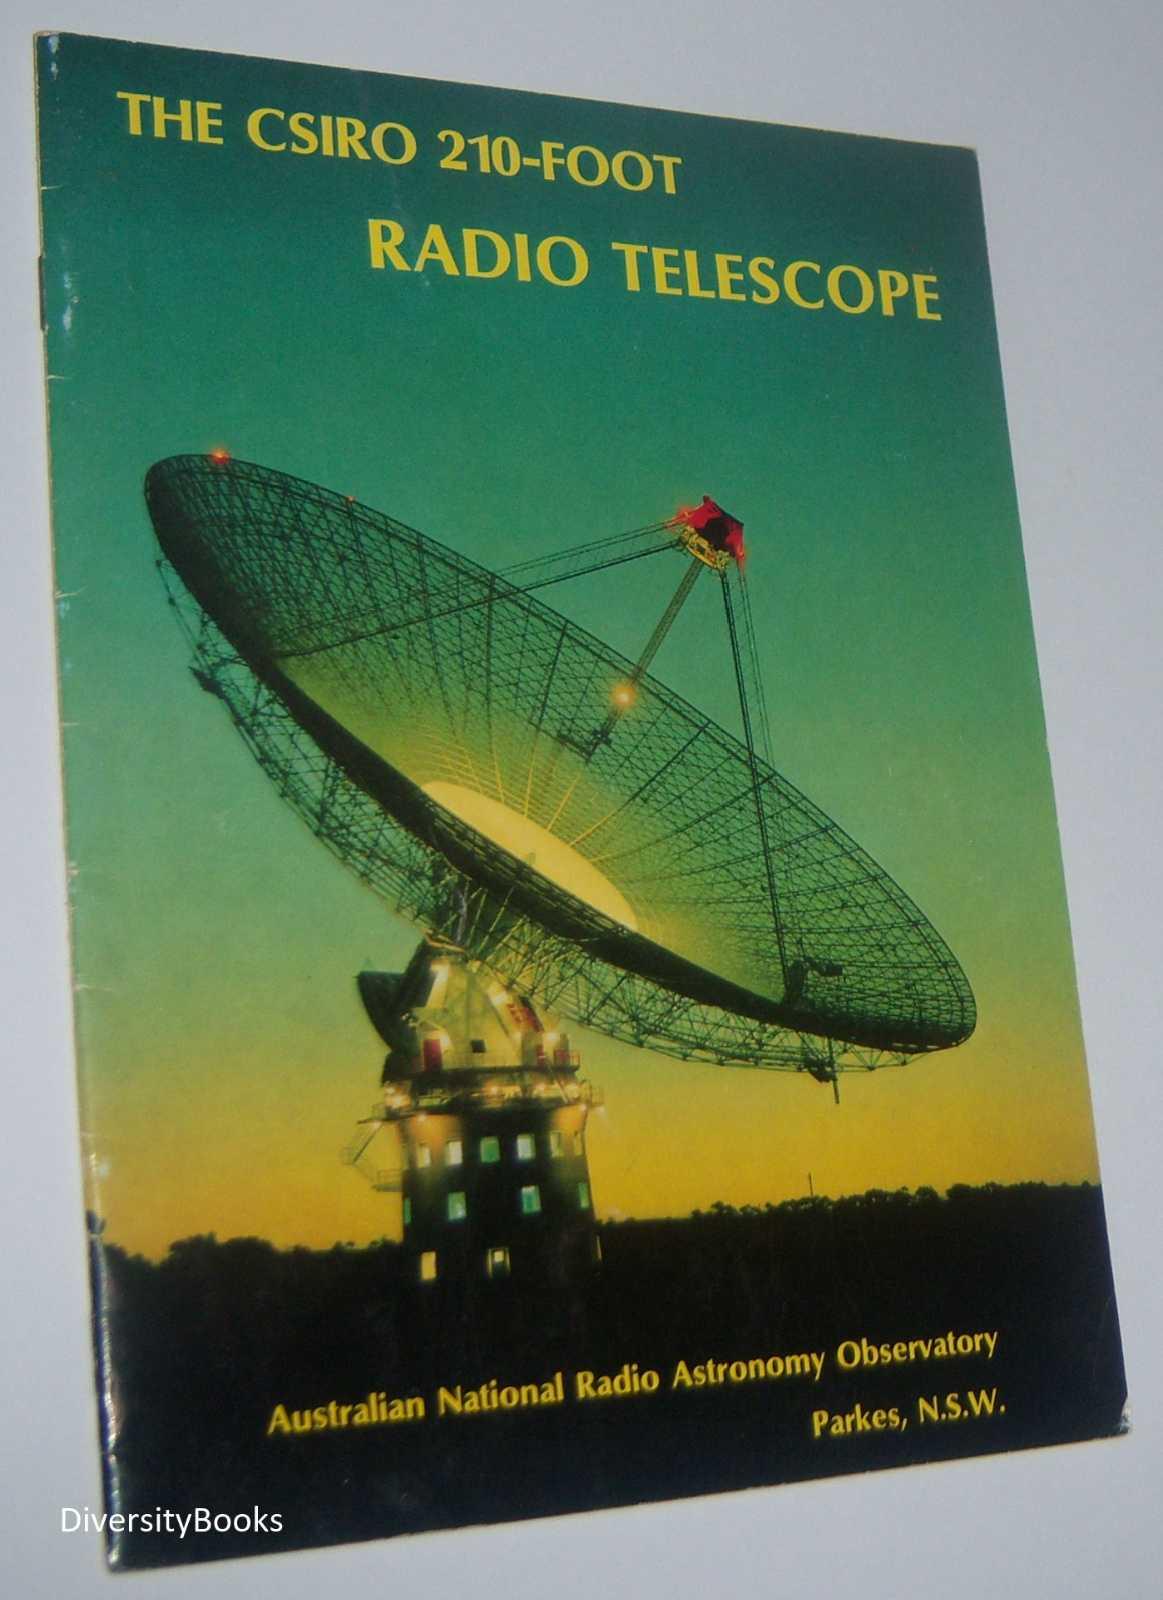 THE CSIRO 210-FOOT RADIO TELESCOPE - Australian National Radio Astronomy Observatory, Parkes, N.S.W.